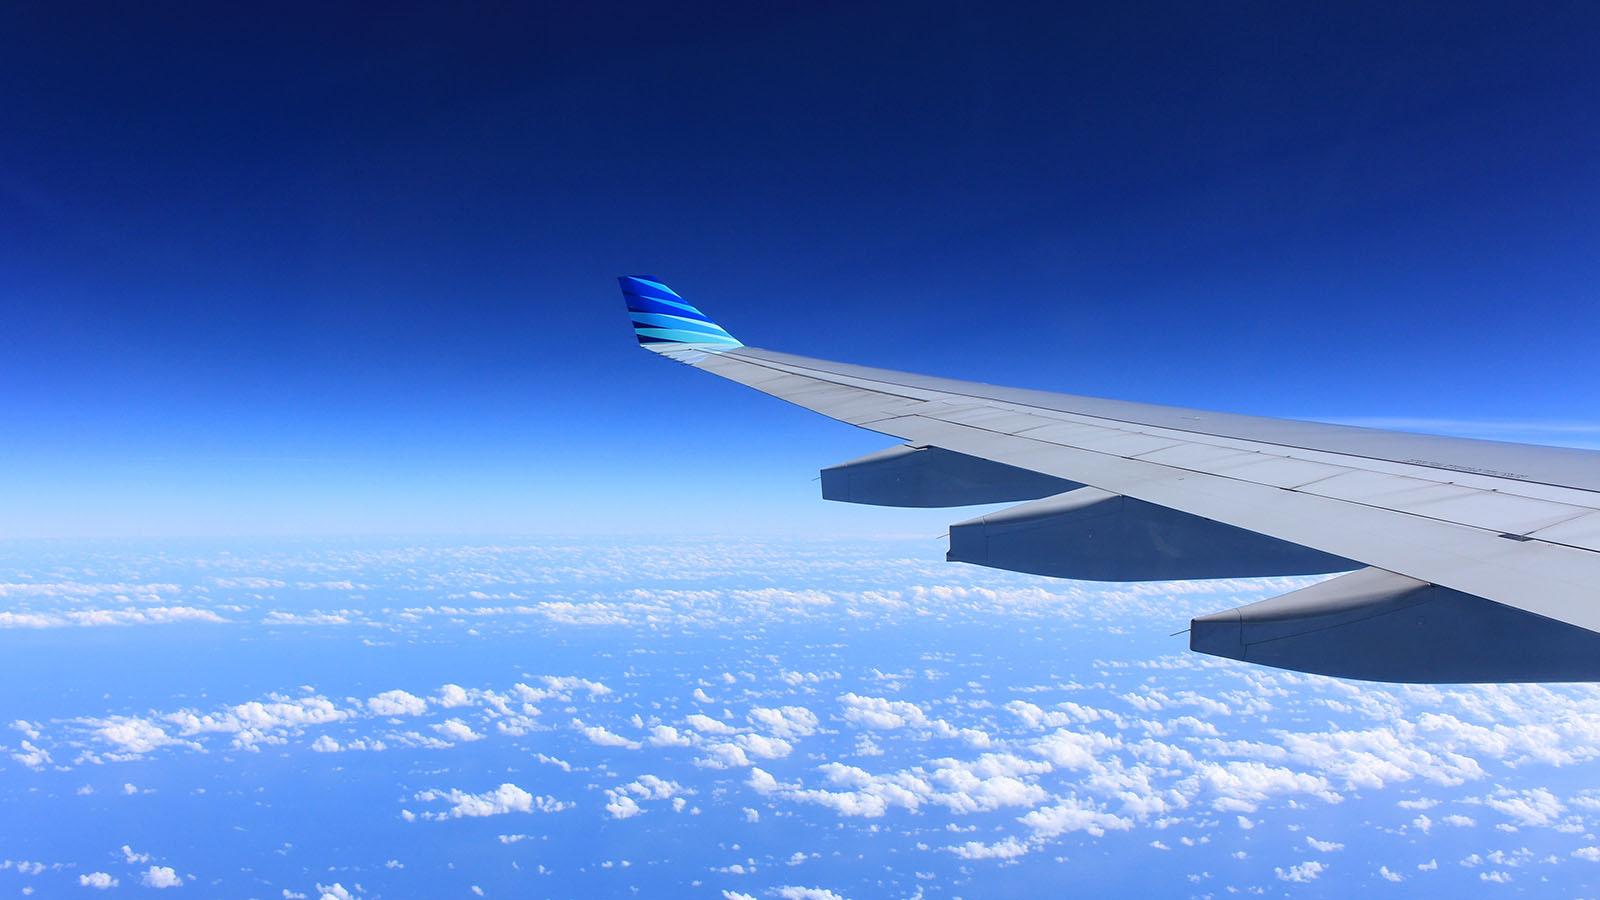 comment-venir-avion-notredamedemonts